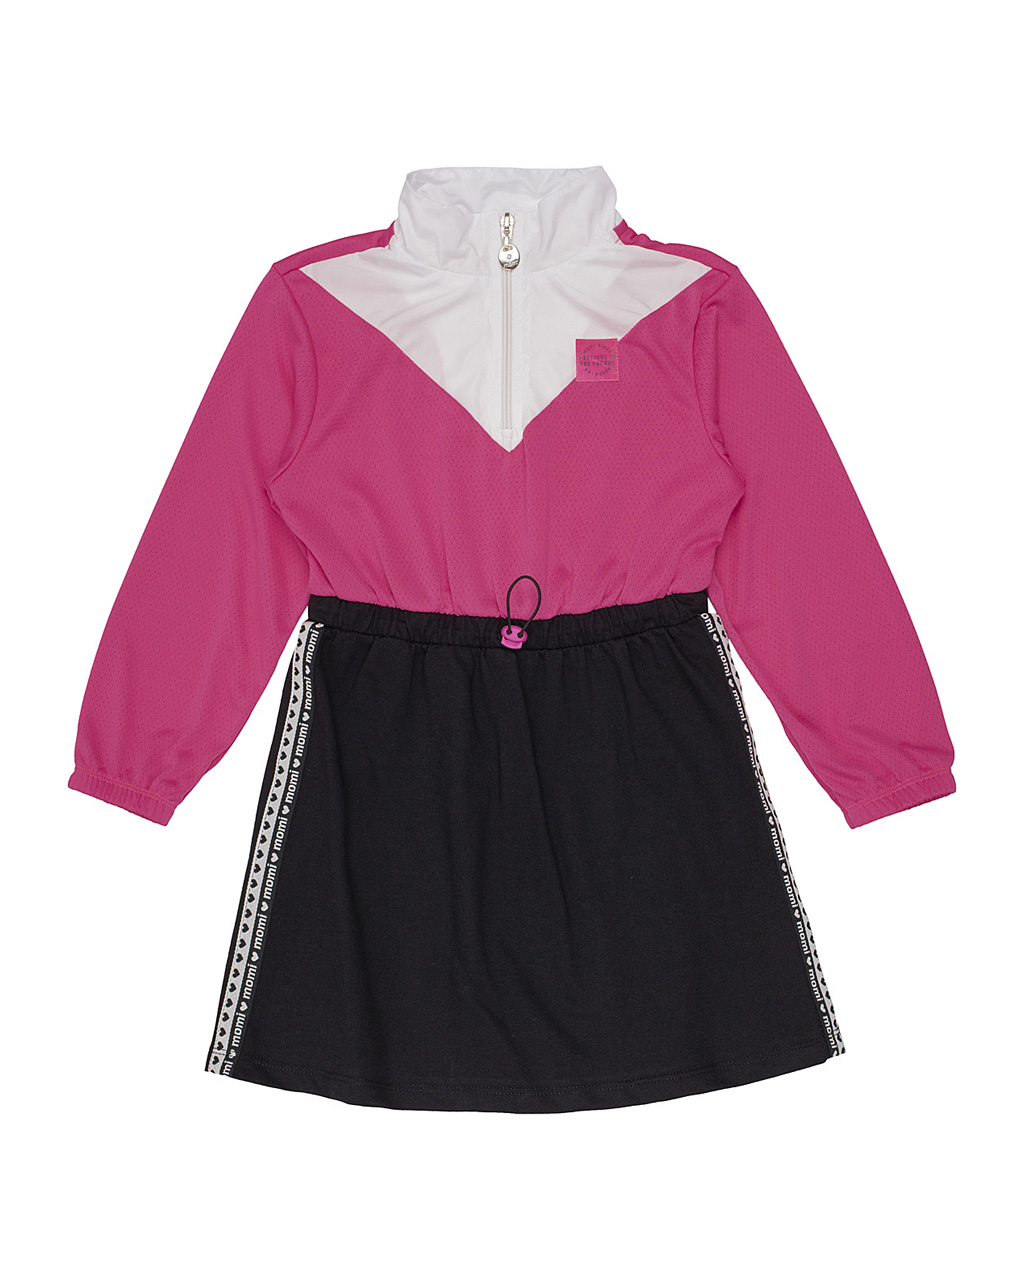 Vestido Infantil Corta Vento com Moletinho Tricolor Momi